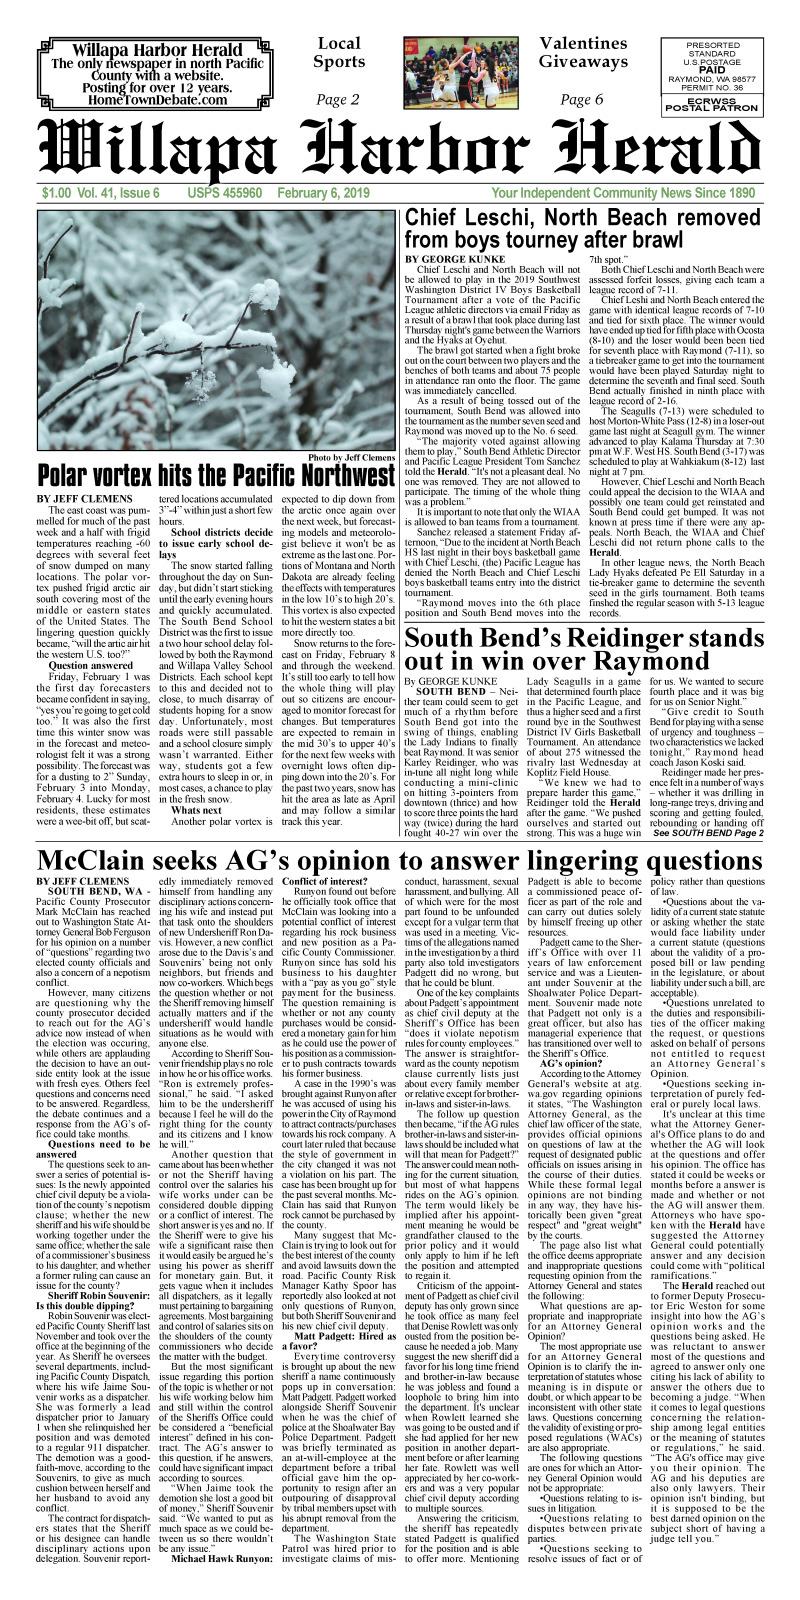 February 6, 2019 Willapa Harbor Herald